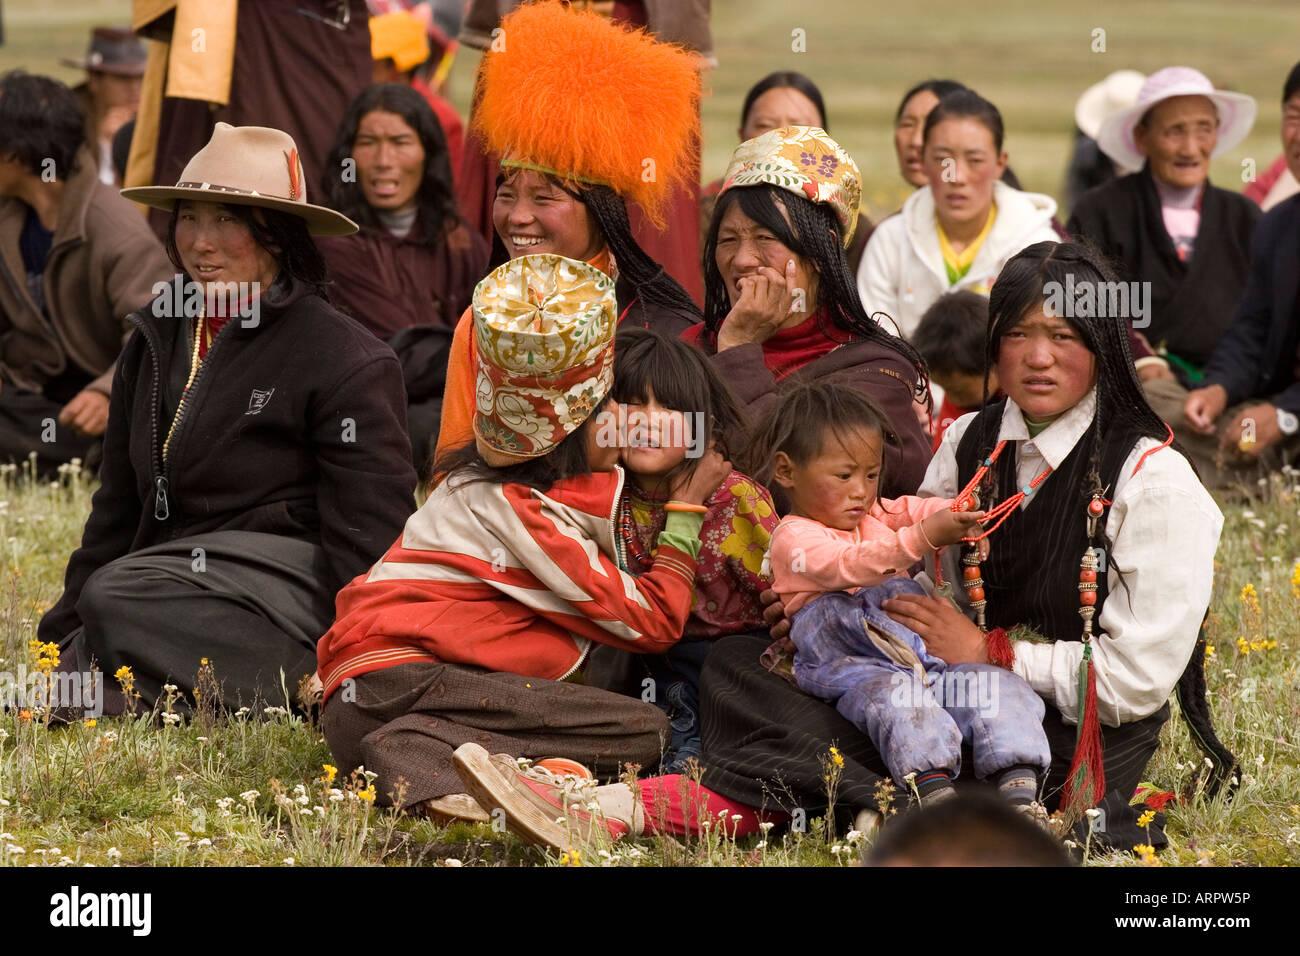 Litang Horse festival, Sichuan, Tibetan Plateau, China - Stock Image